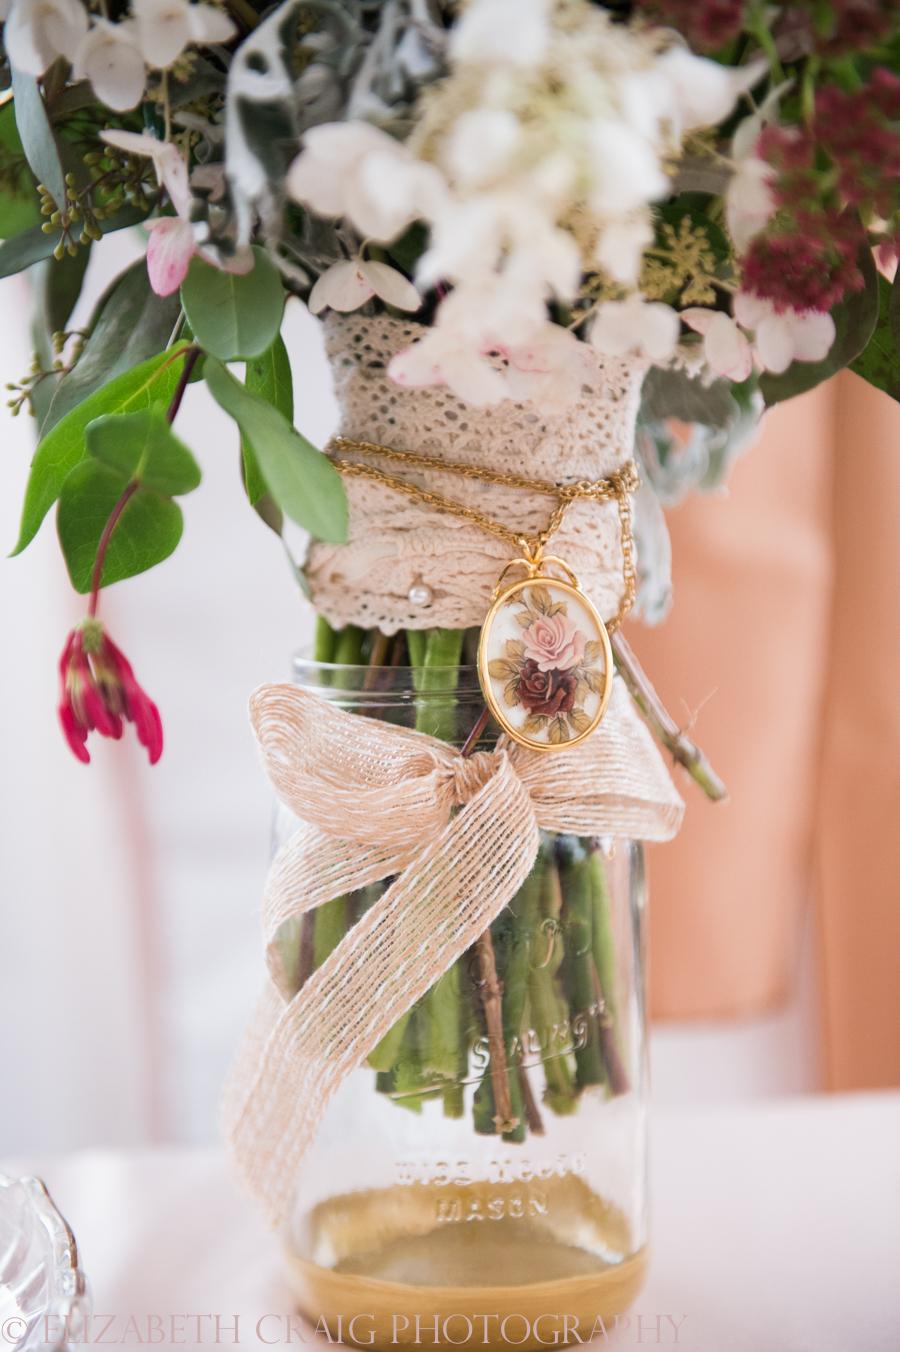 Dubois Brockway St. Marys PA Weddings-0193